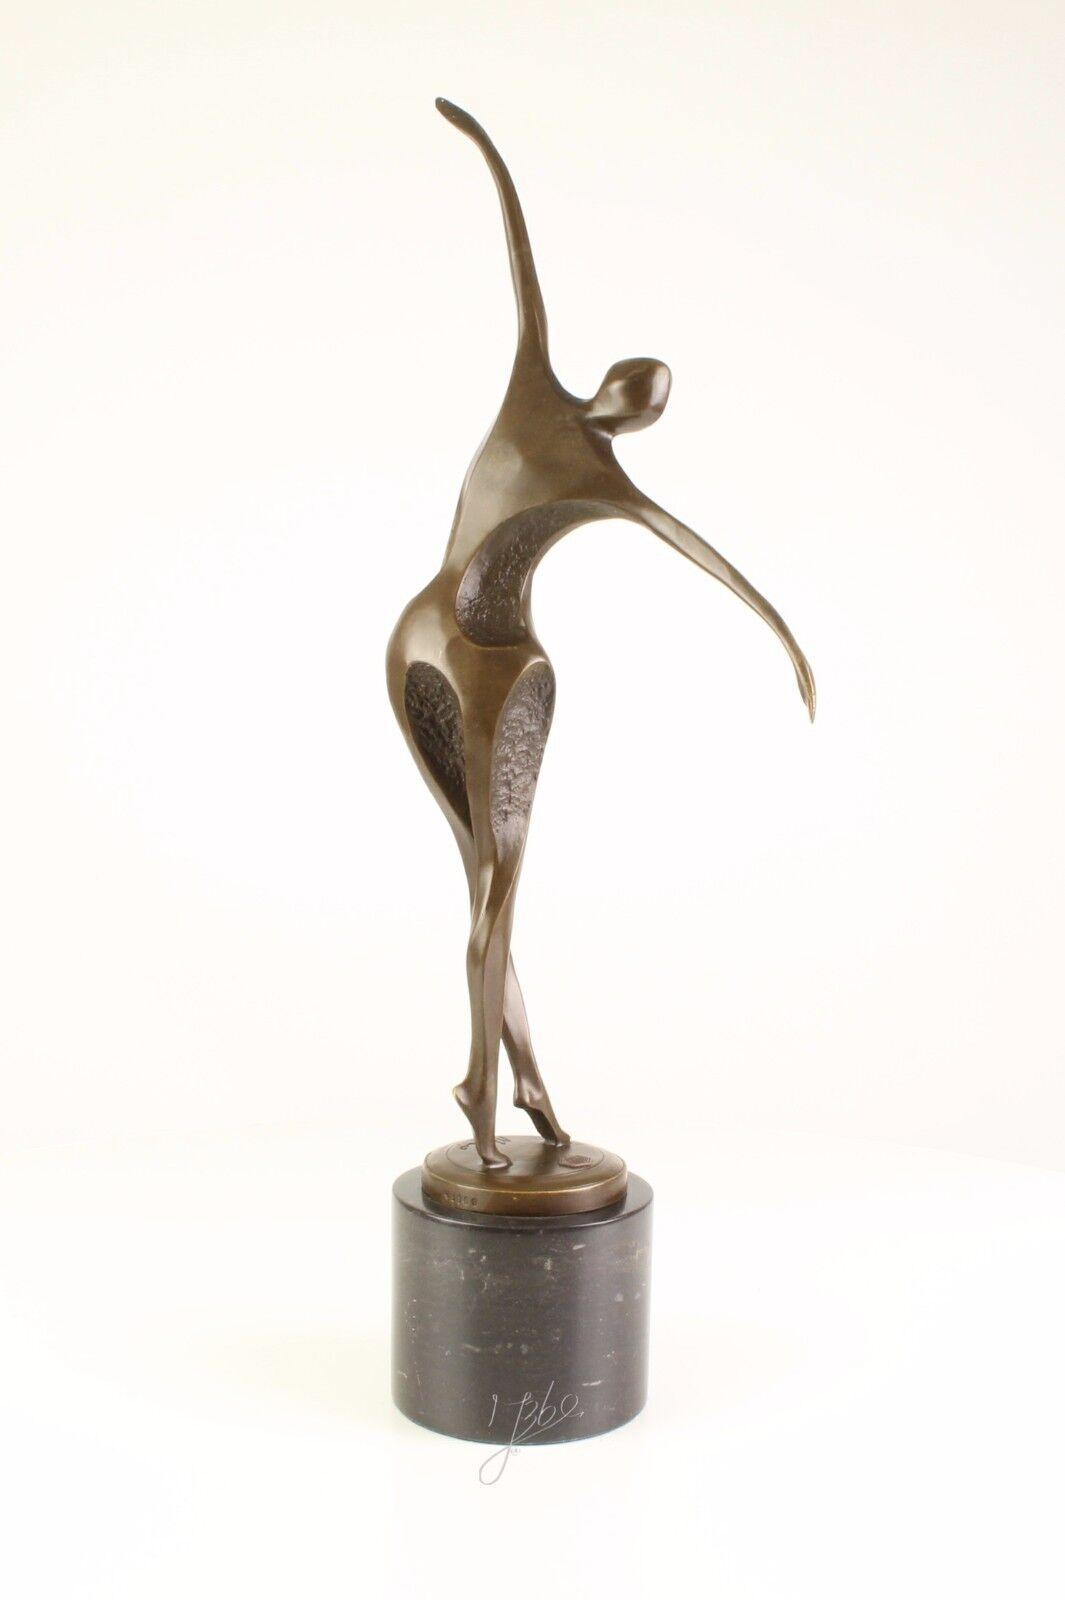 Bronze Skulptur modernistisch tanzender Mann neu 9973424-dssp 9973424-dssp 9973424-dssp f02cb7